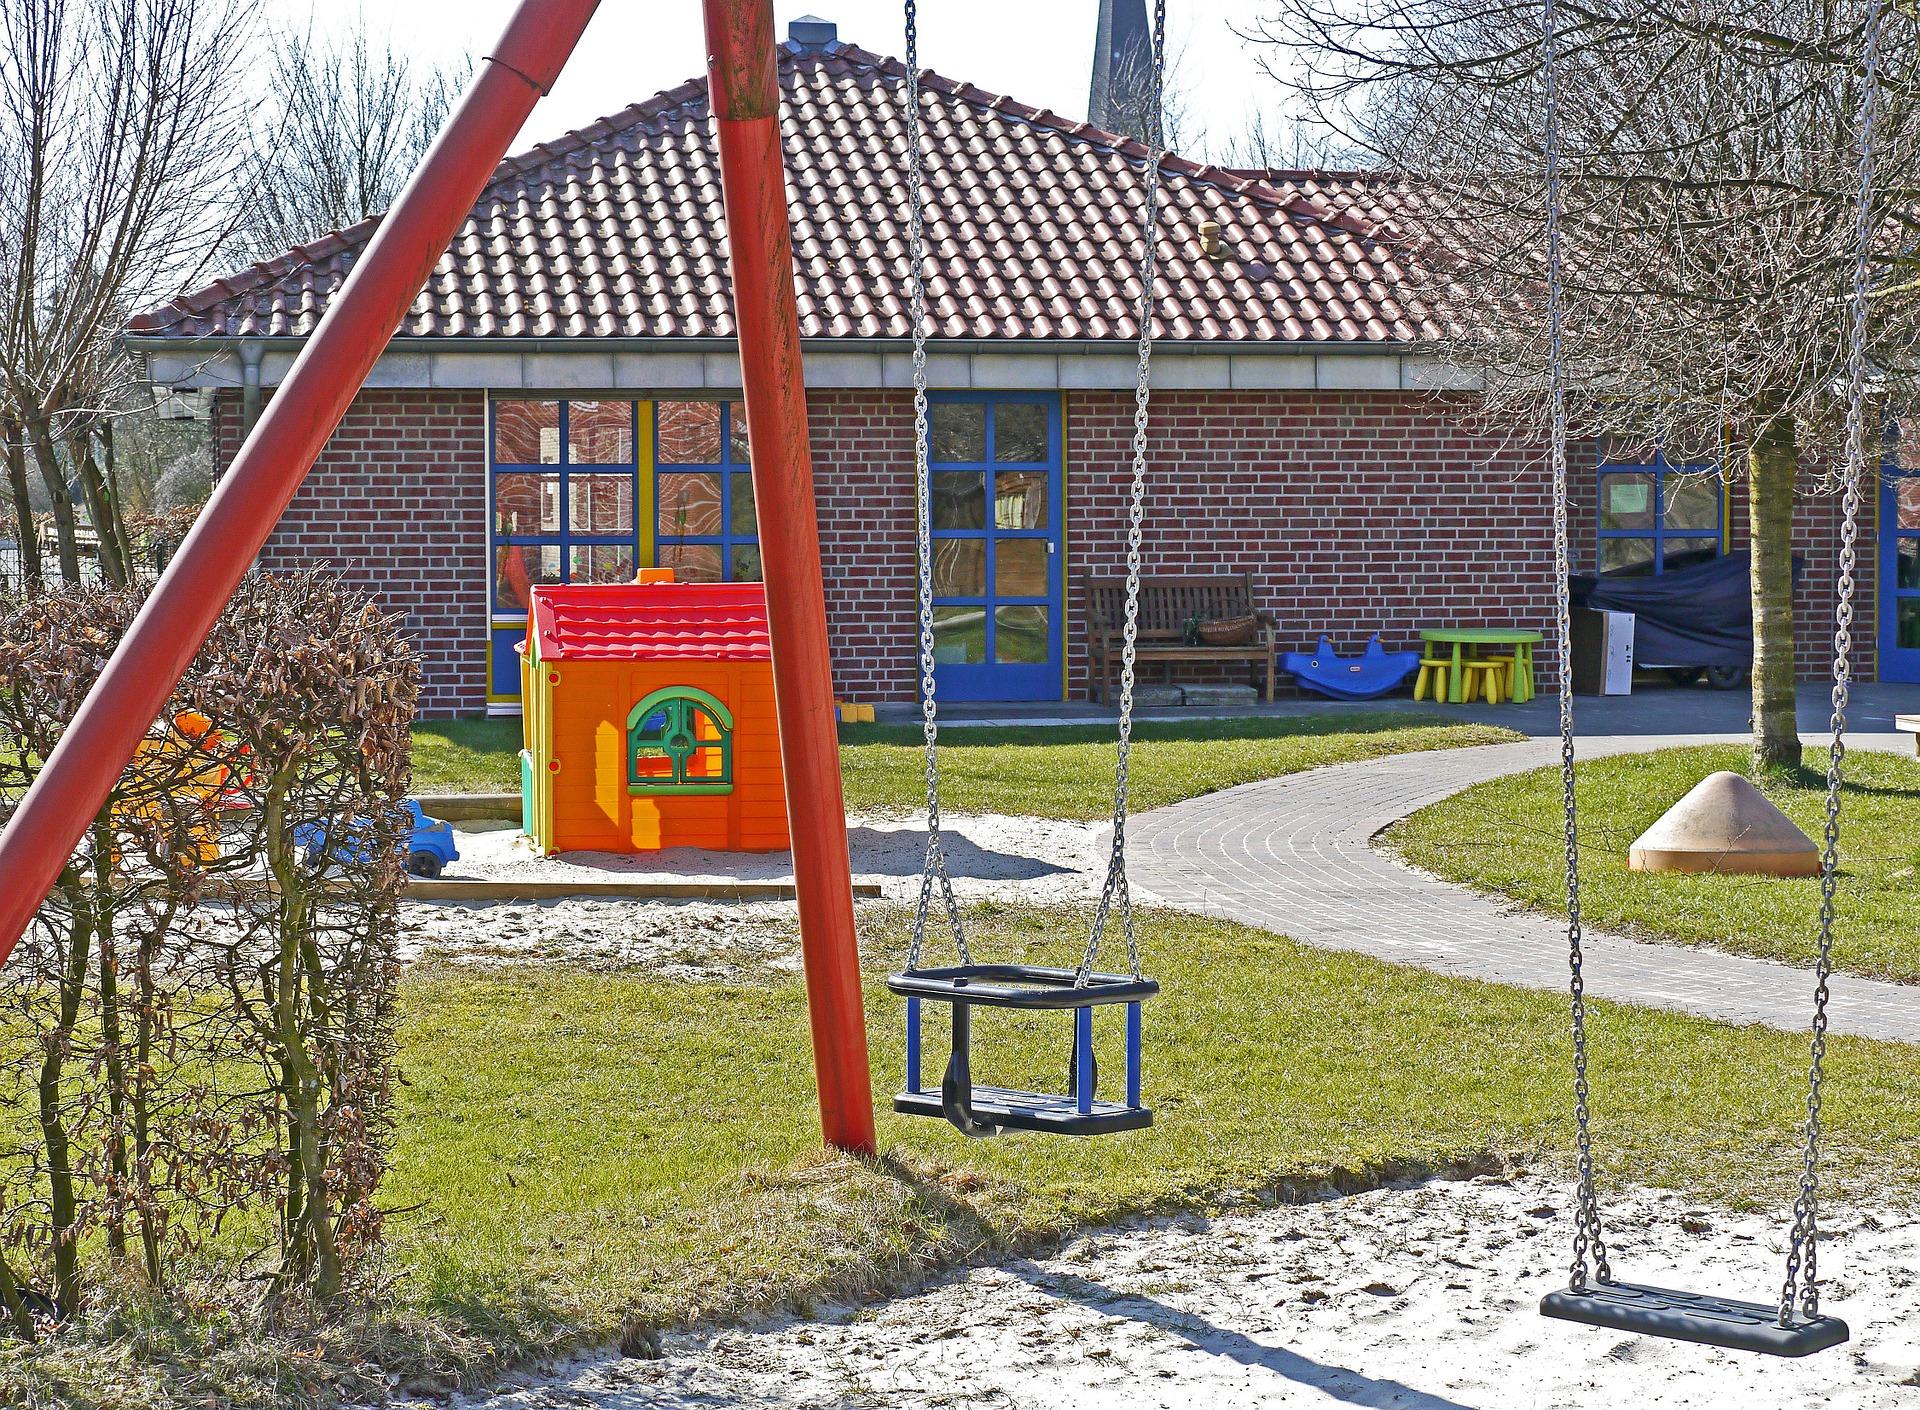 kindergarten-1322559_1920.jpg